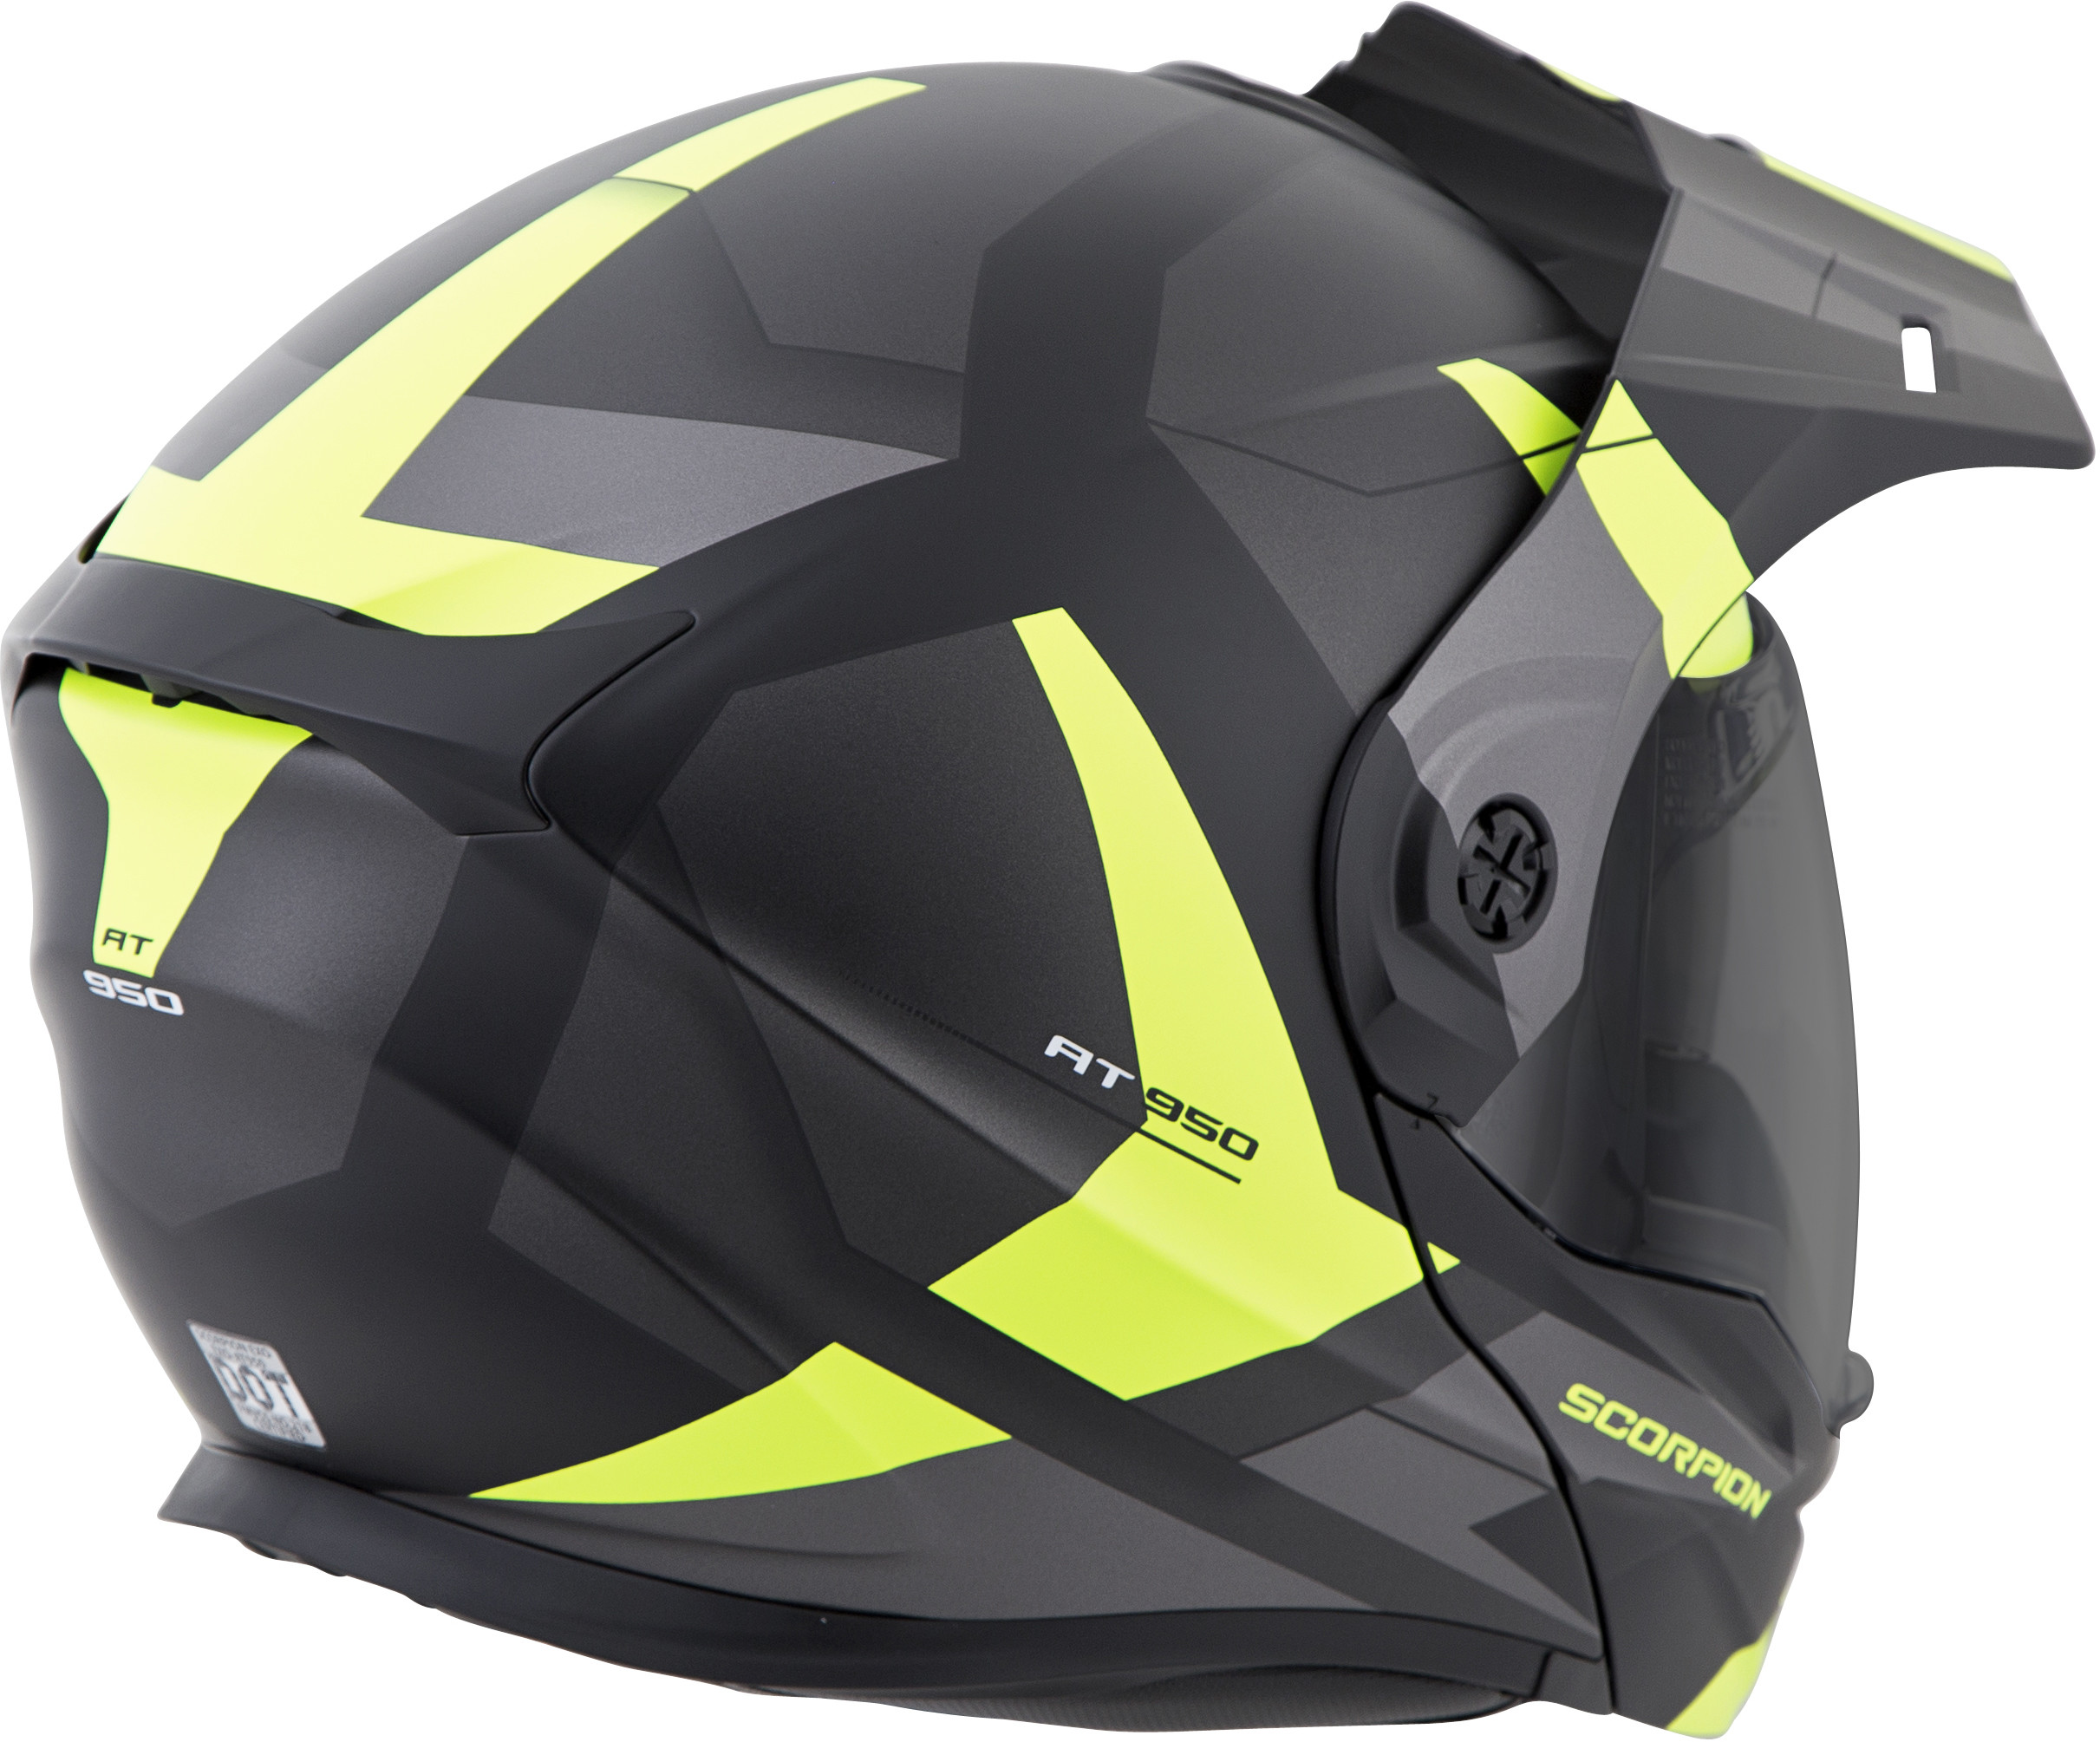 for-Scorpion-Helmet-EXO-AT950-Neocon-Snow-Helmet-with-Dual-Lens-Shield miniature 41